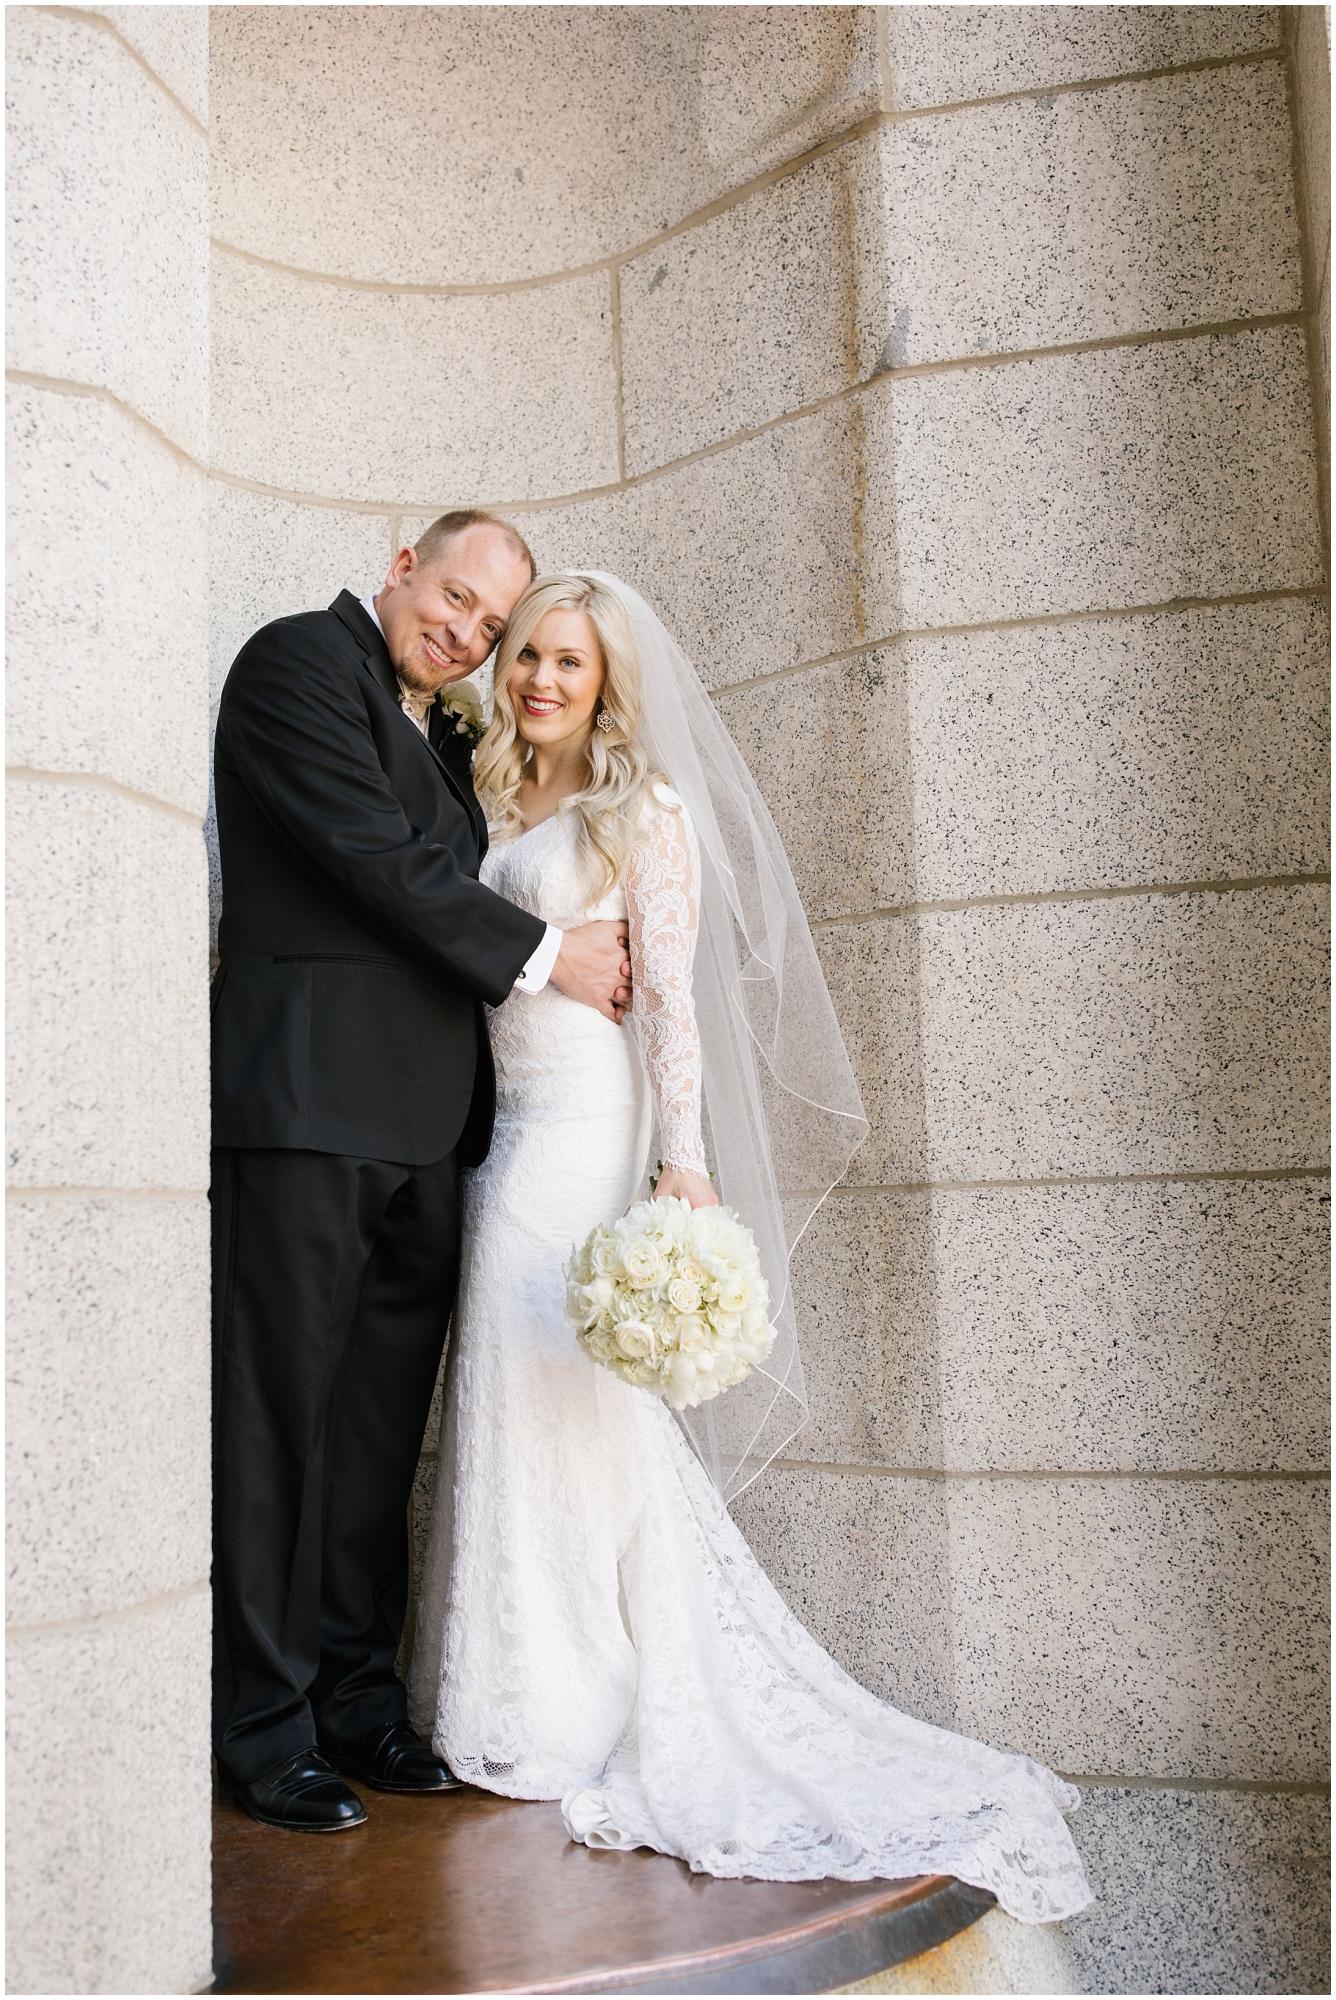 CherylandTyler-144_Lizzie-B-Imagery-Utah-Wedding-Photographer-Park-City-Salt-Lake-City-Temple-Wells-Fargo-Building.jpg